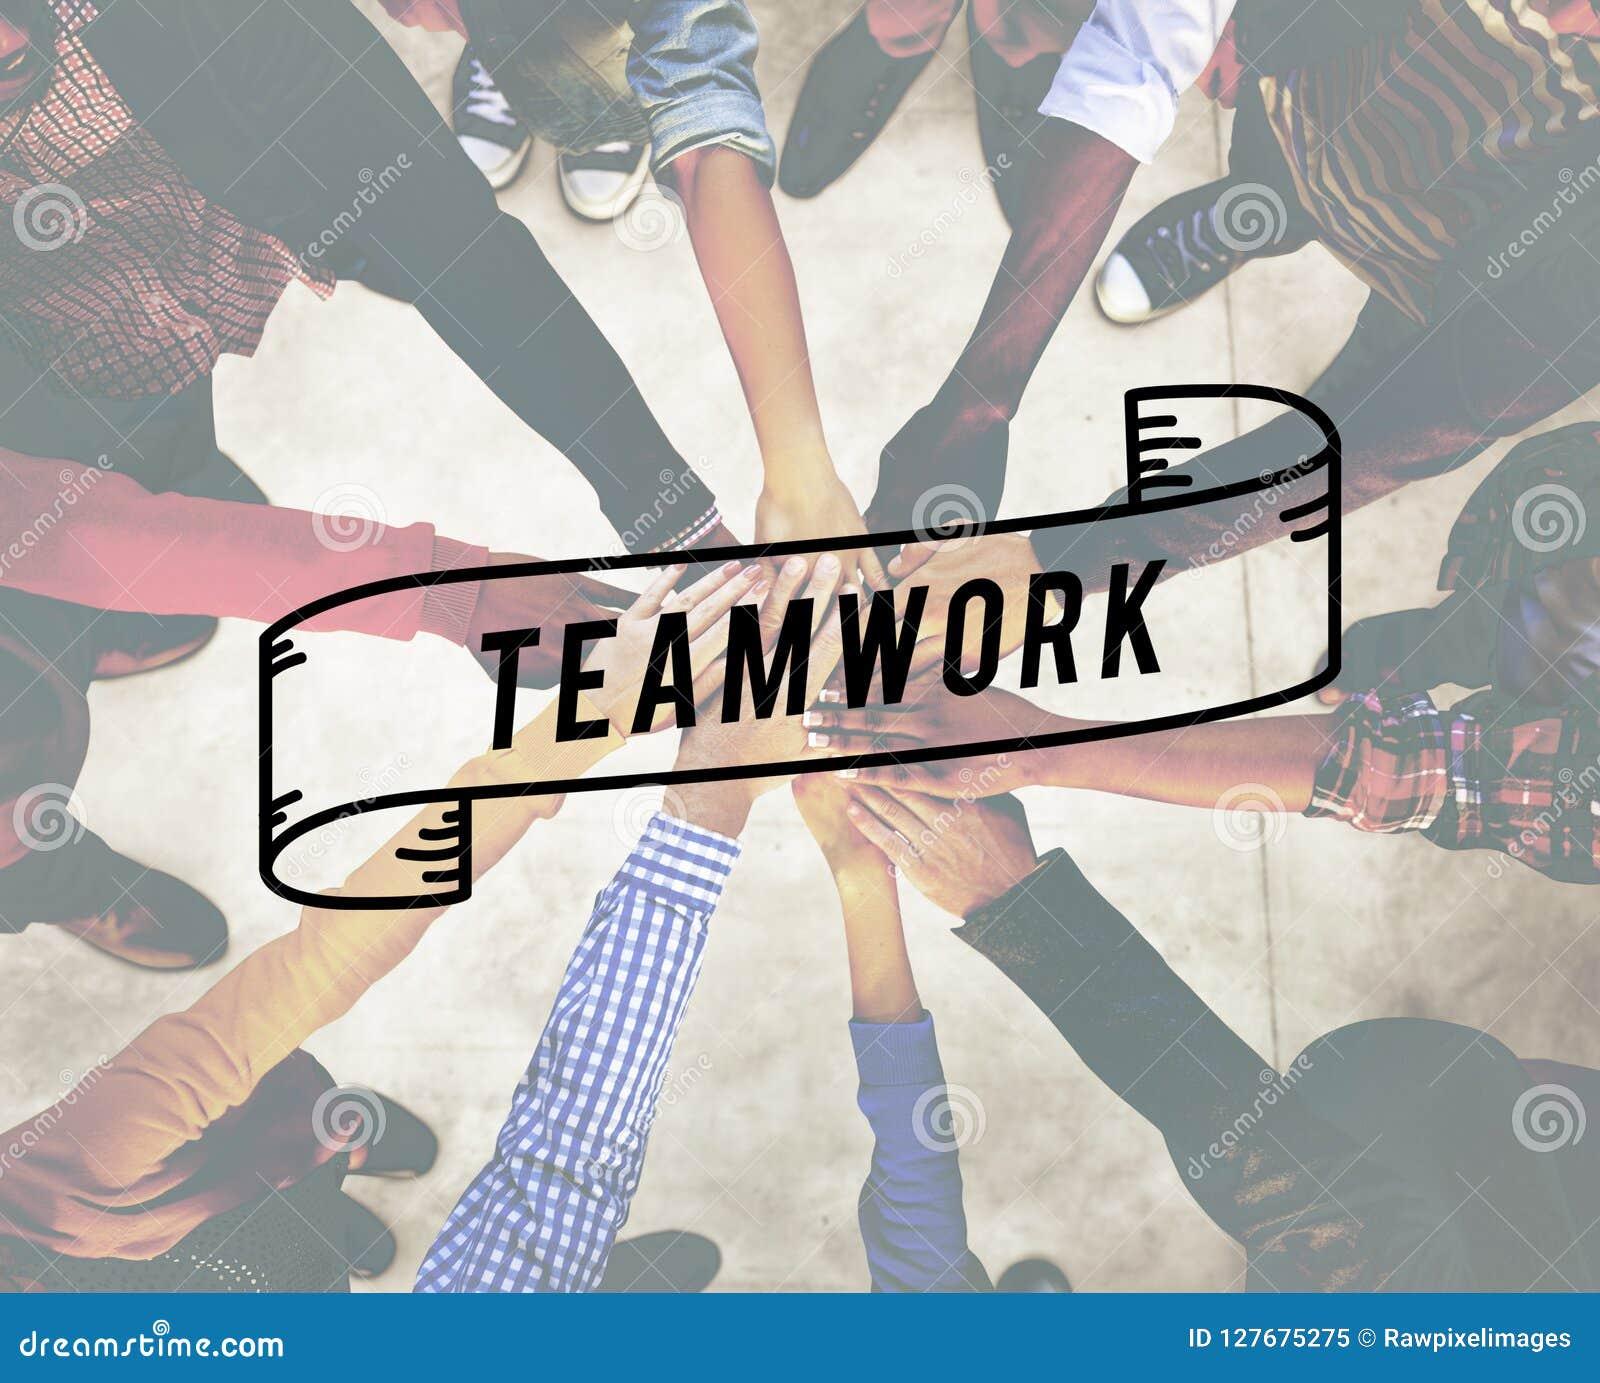 Teamwork Team Building Cooperation Relationship Concept